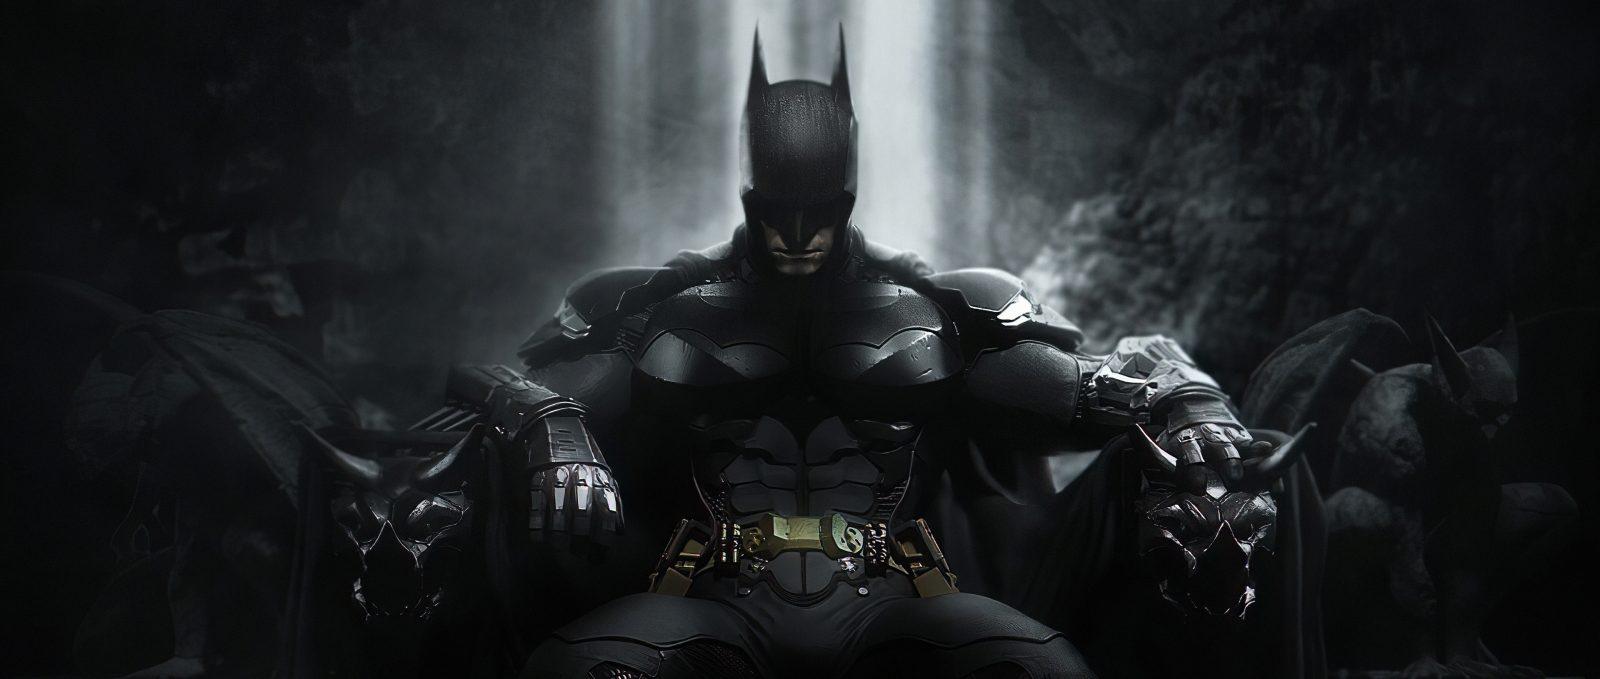 Премьера «Бэтмена» Мэтта Ривза перенесена